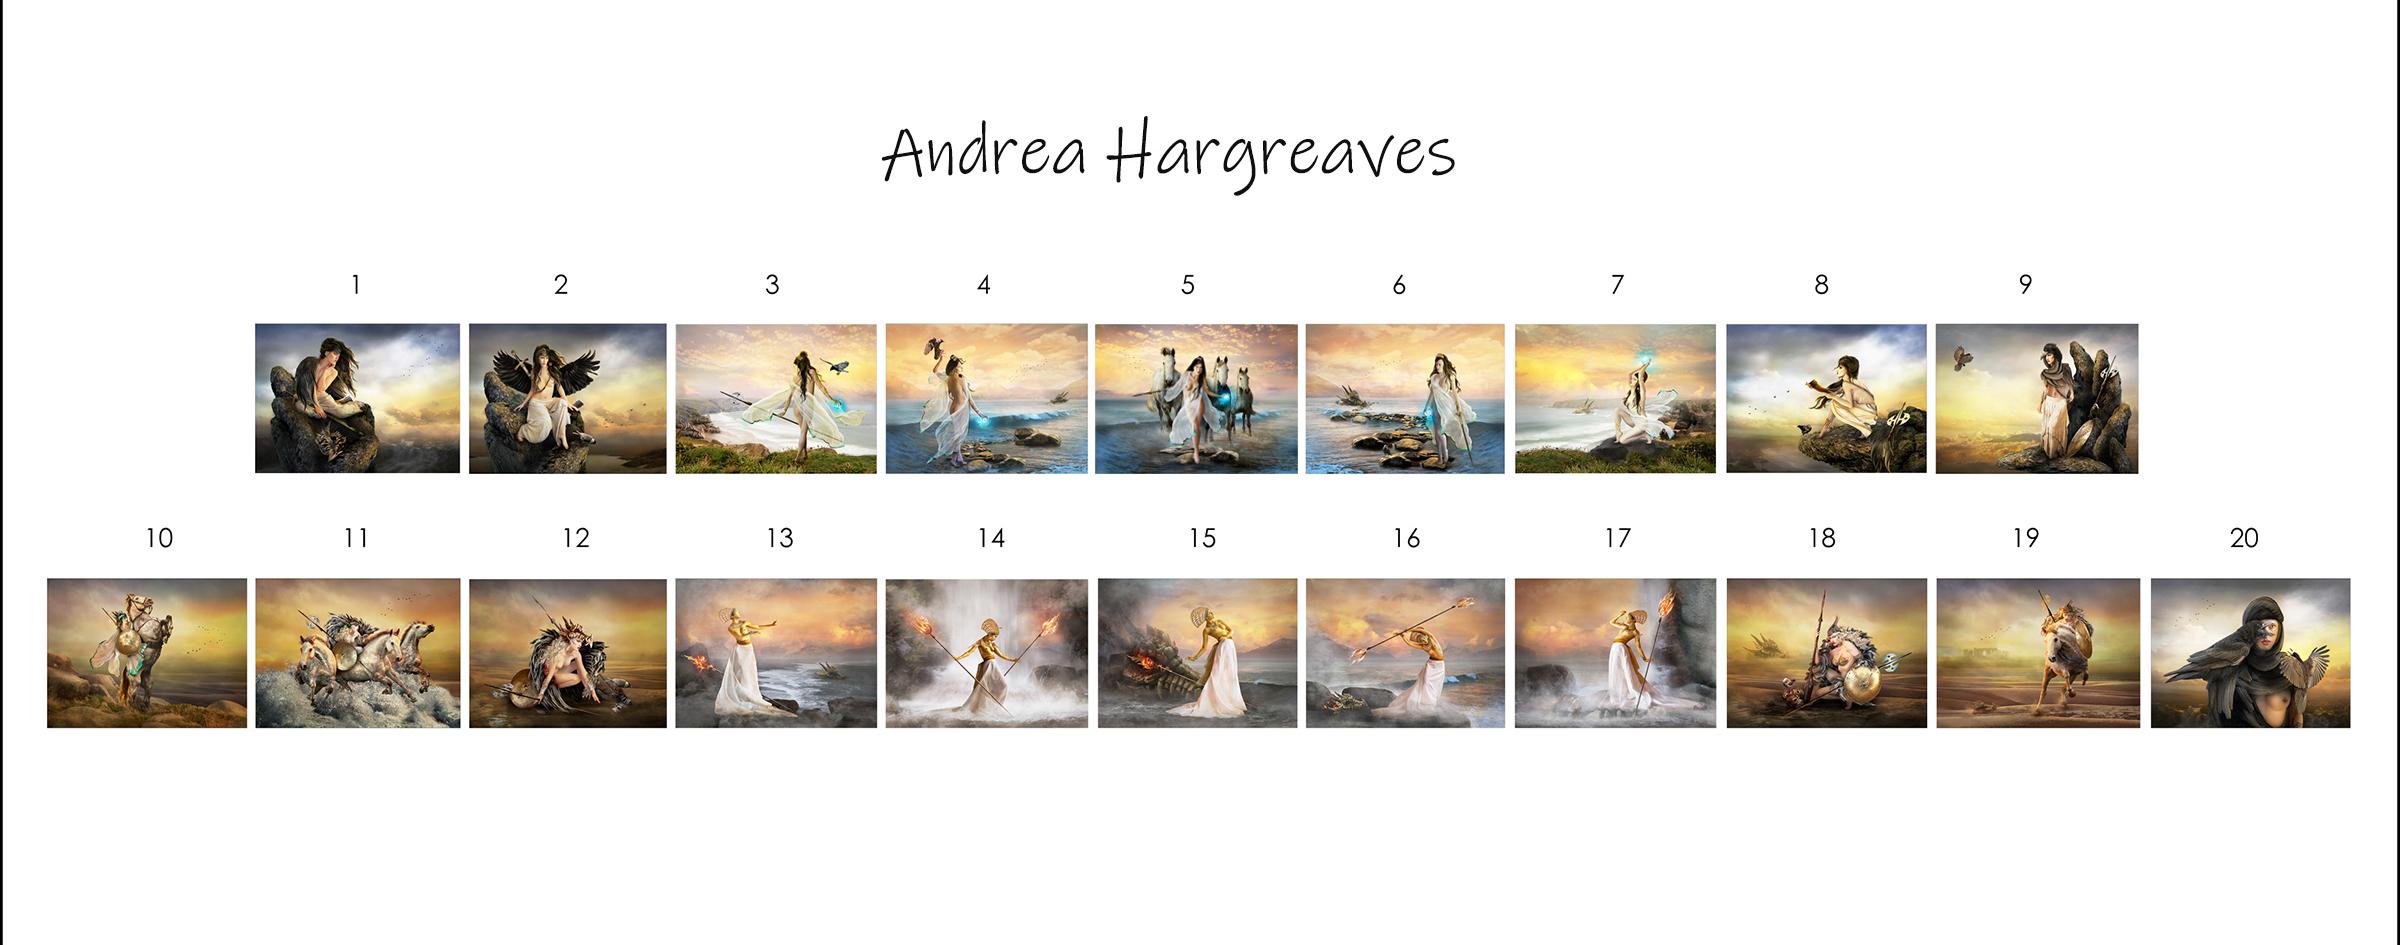 Andrea Hargreaves